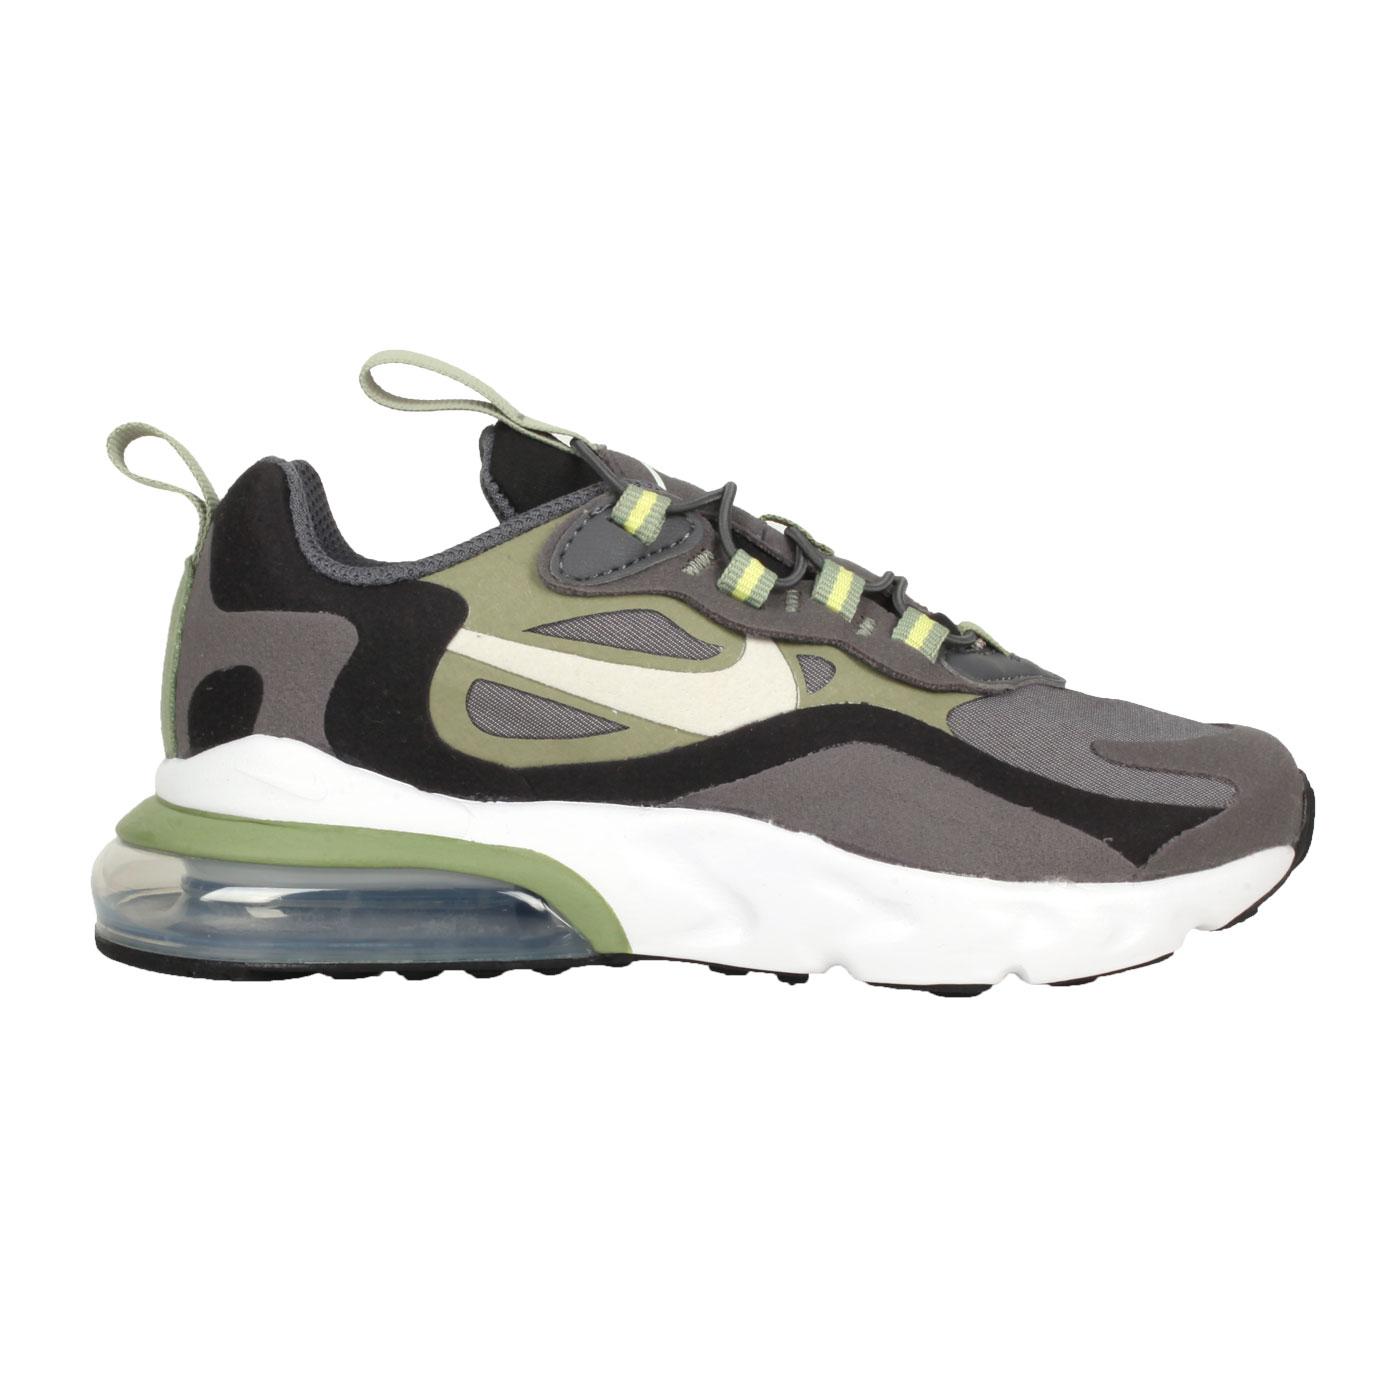 NIKE 中童運動休閒鞋  @AIR MAX 270 RT (PS)@BQ0102022 - 灰黑綠